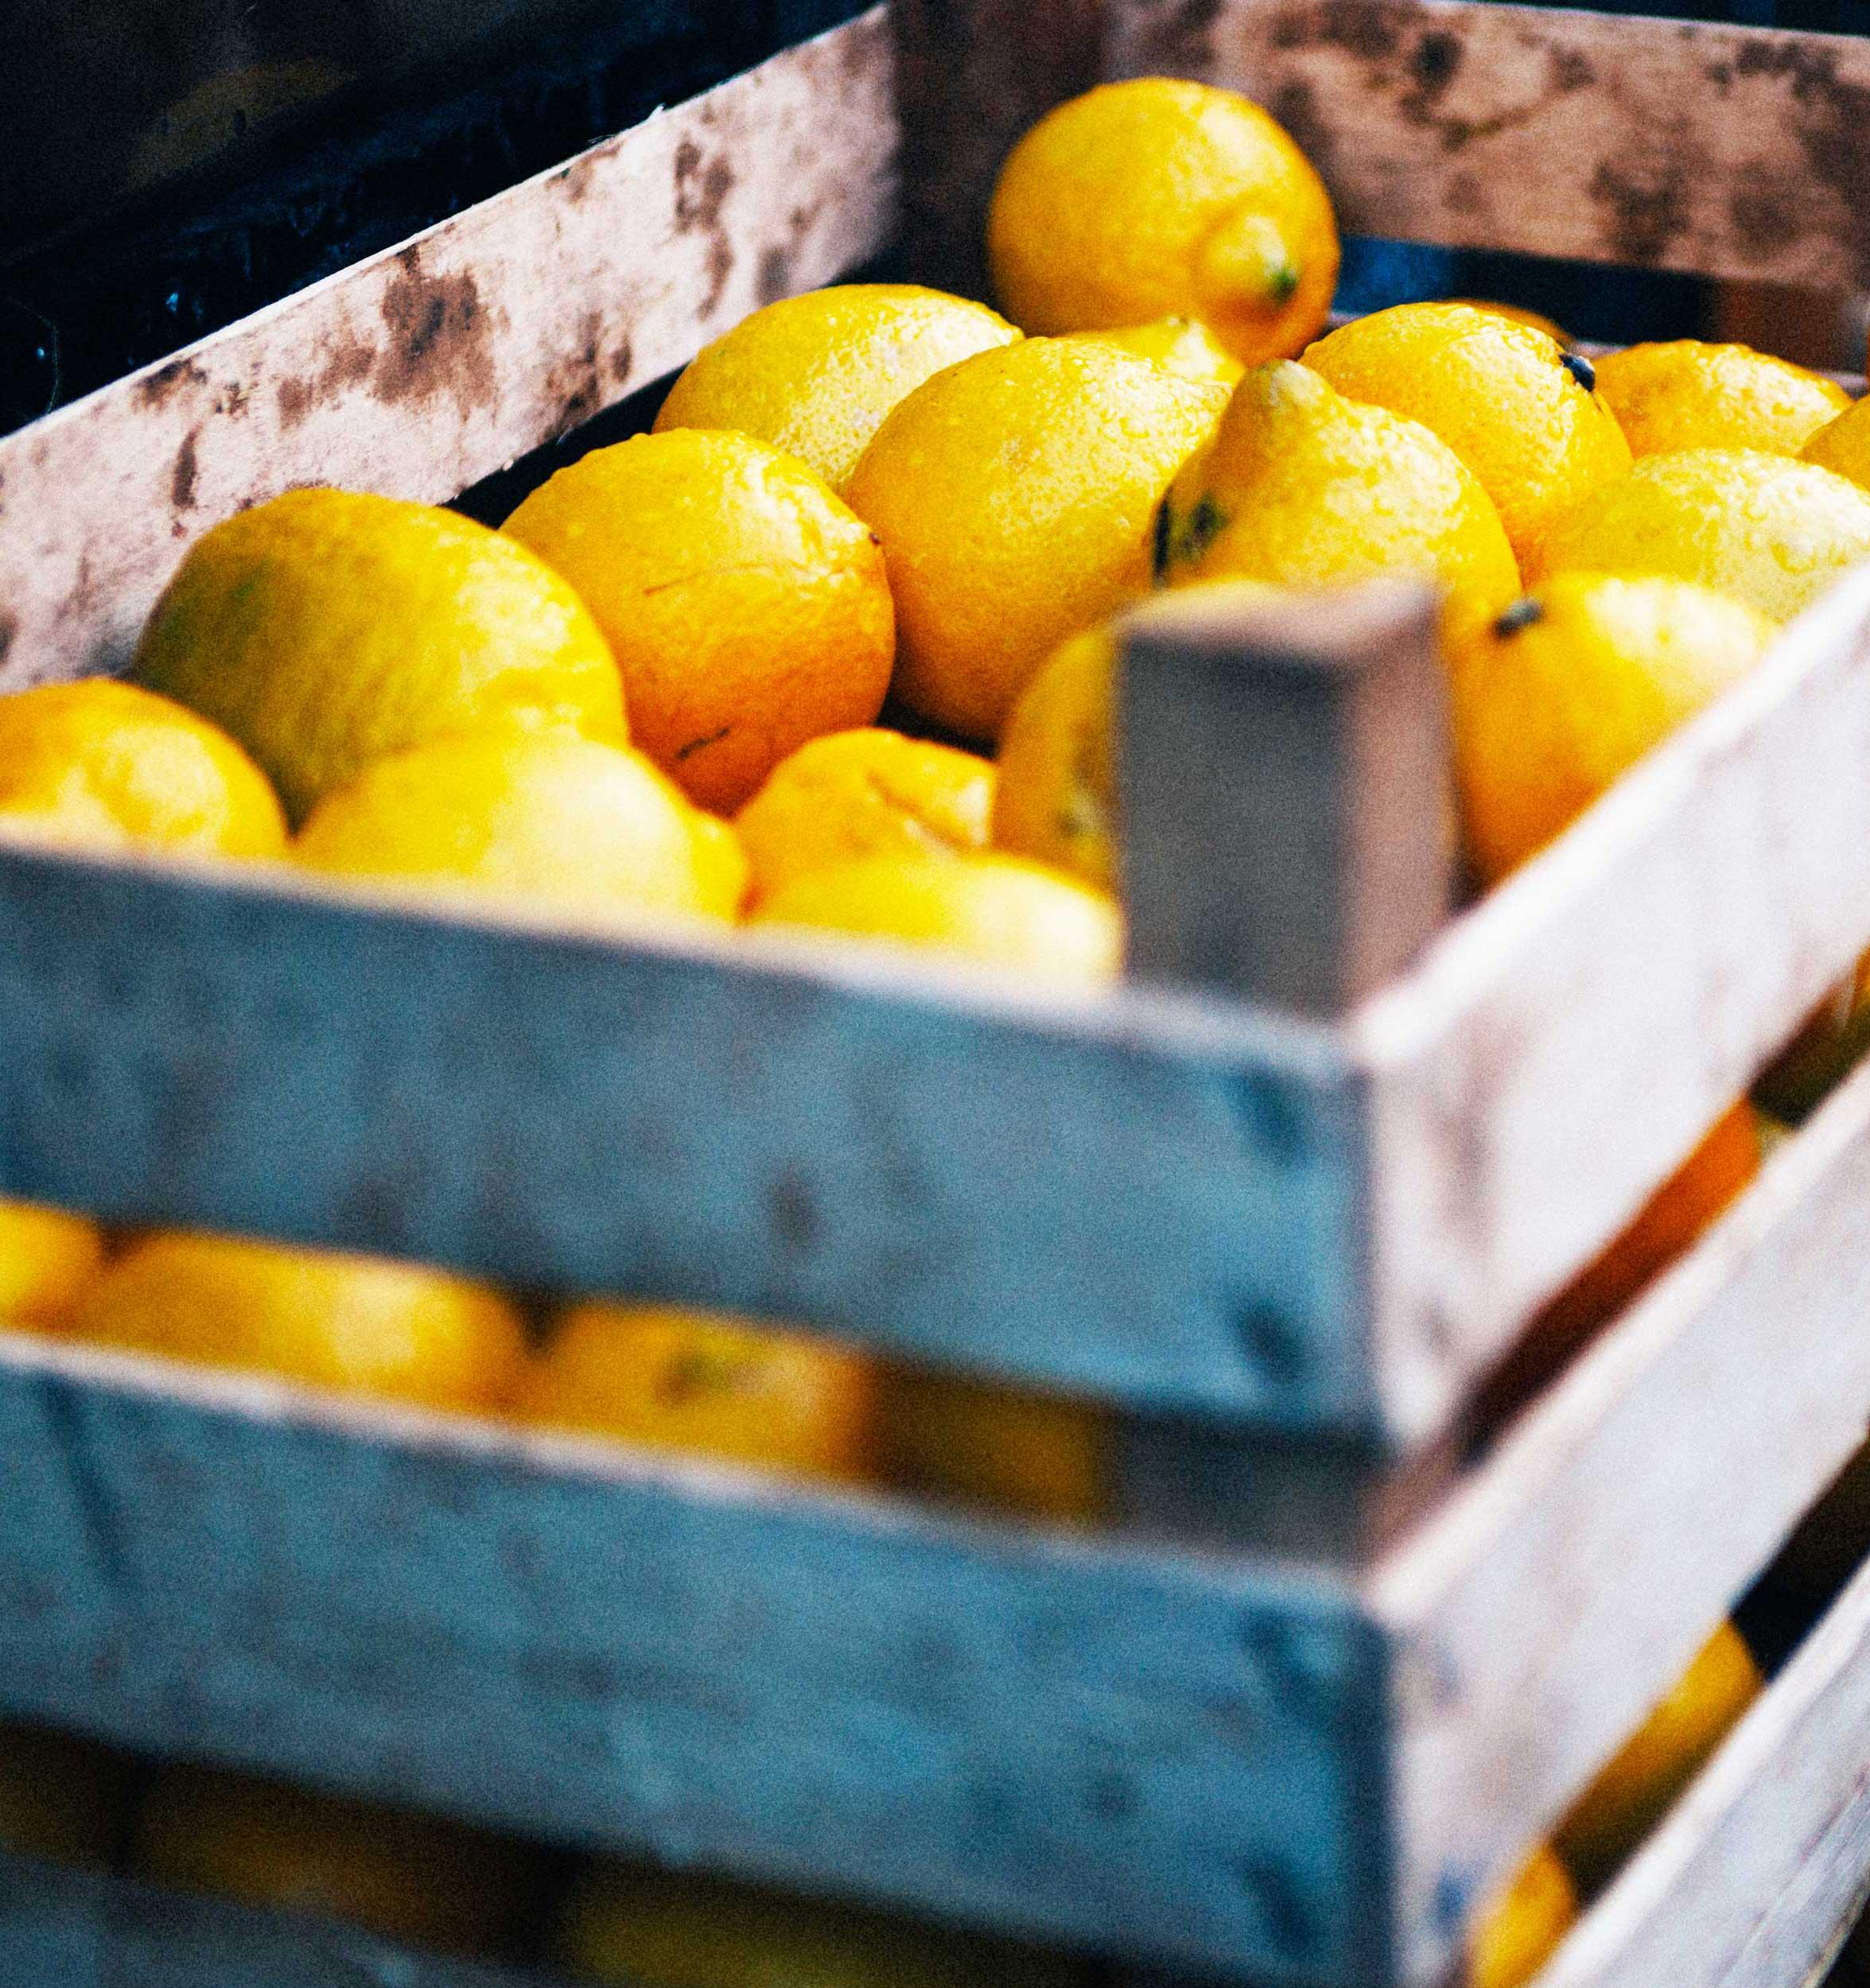 Lemons in wood crate.